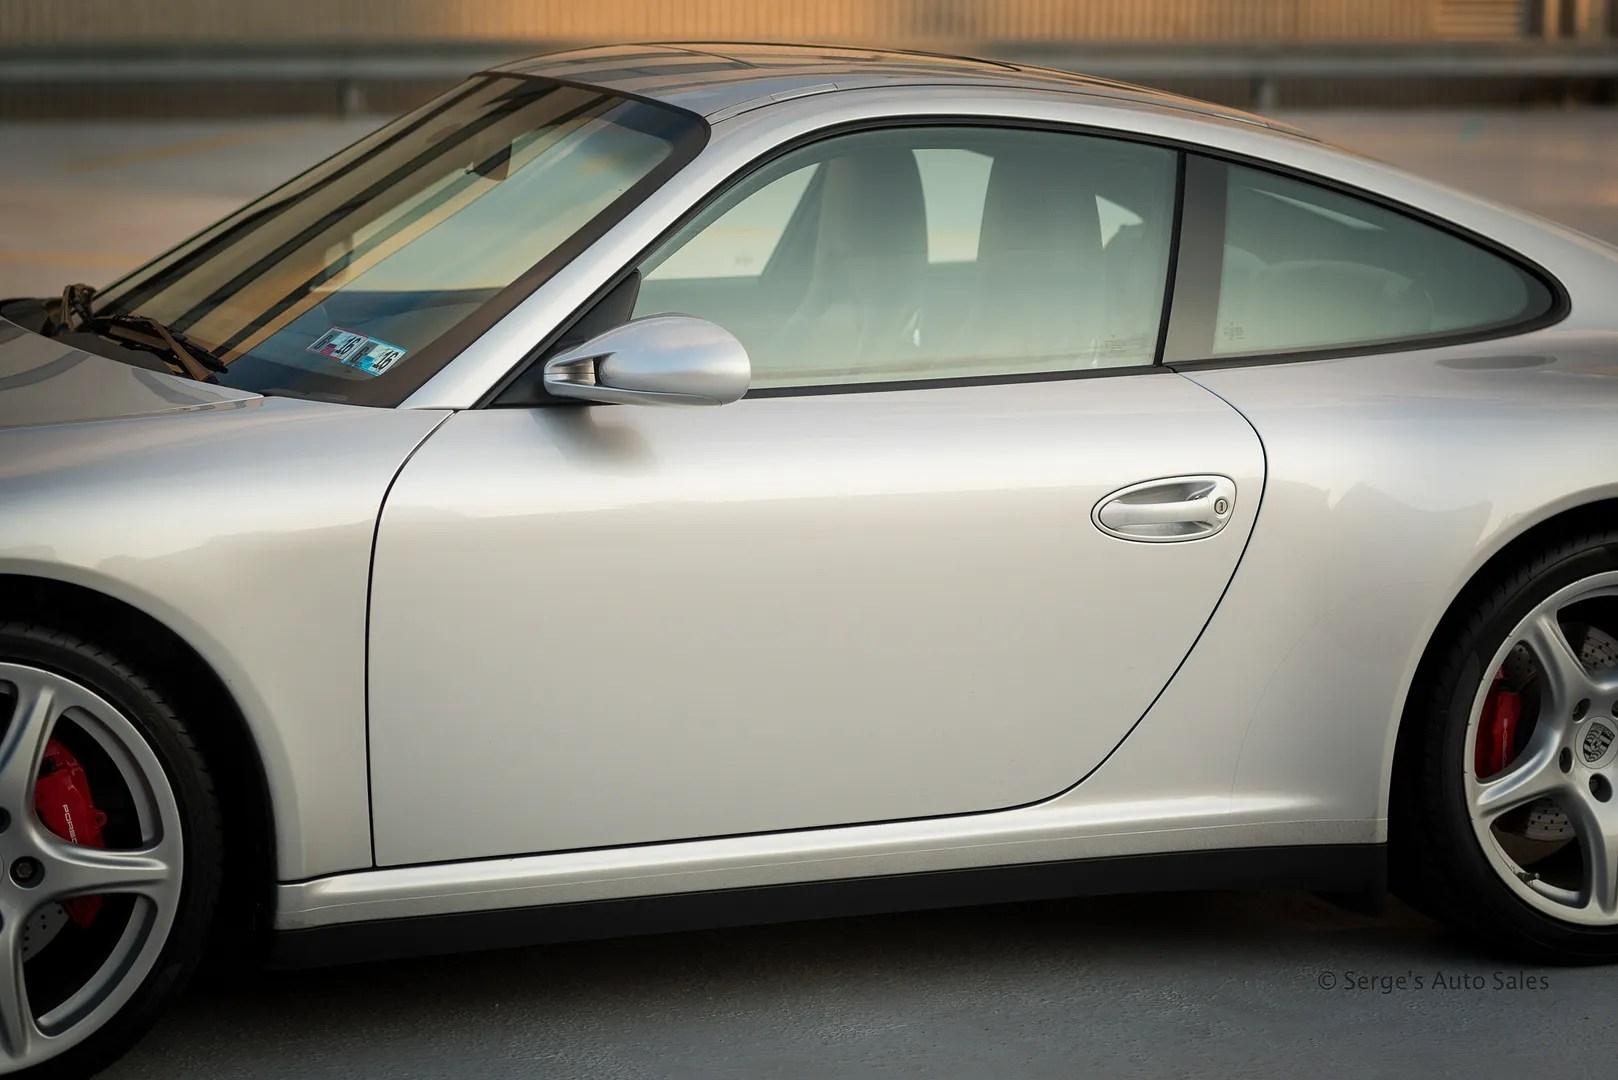 photo Serges-auto-sales-porsche-911-for-sale-scranton-pennsylvania-19_zpsjrddeumn.jpg